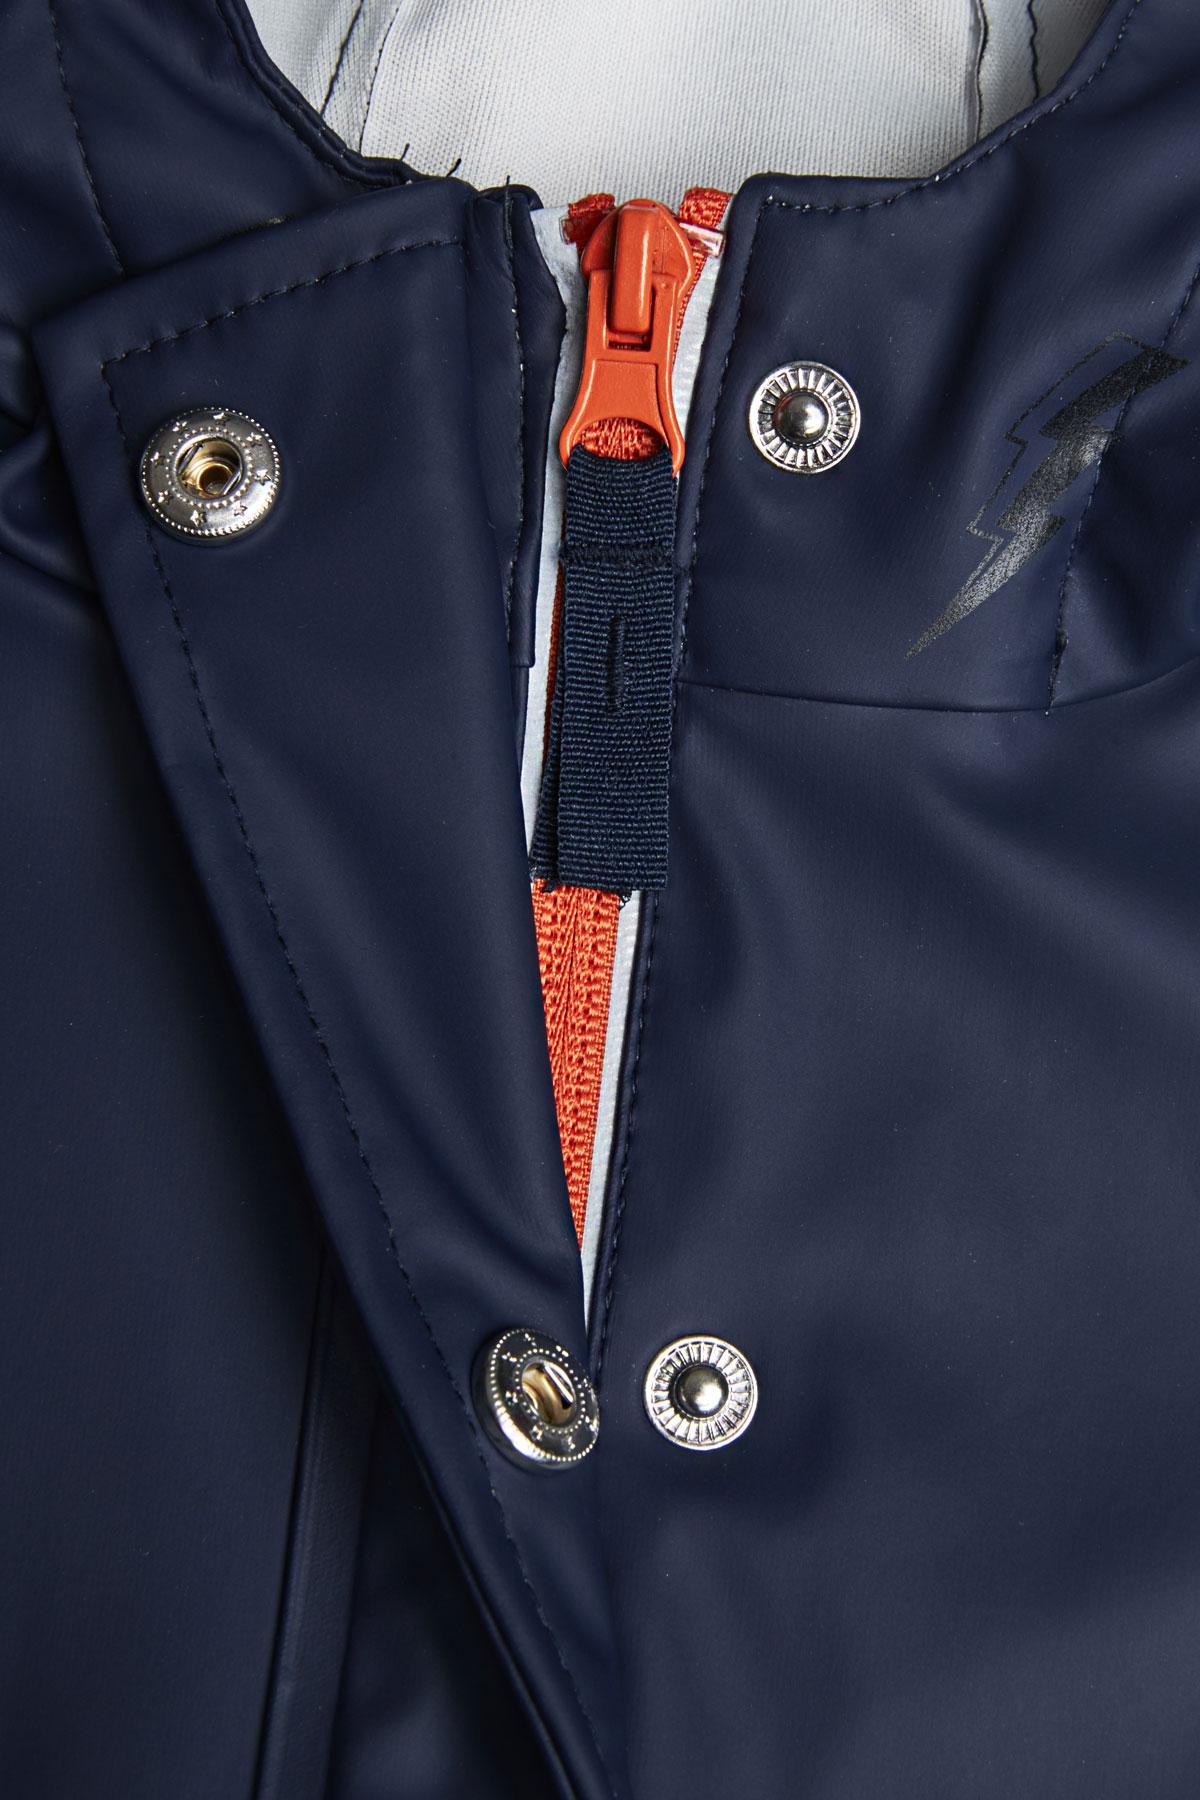 reflective light catcher rain mac zip and press stud detail